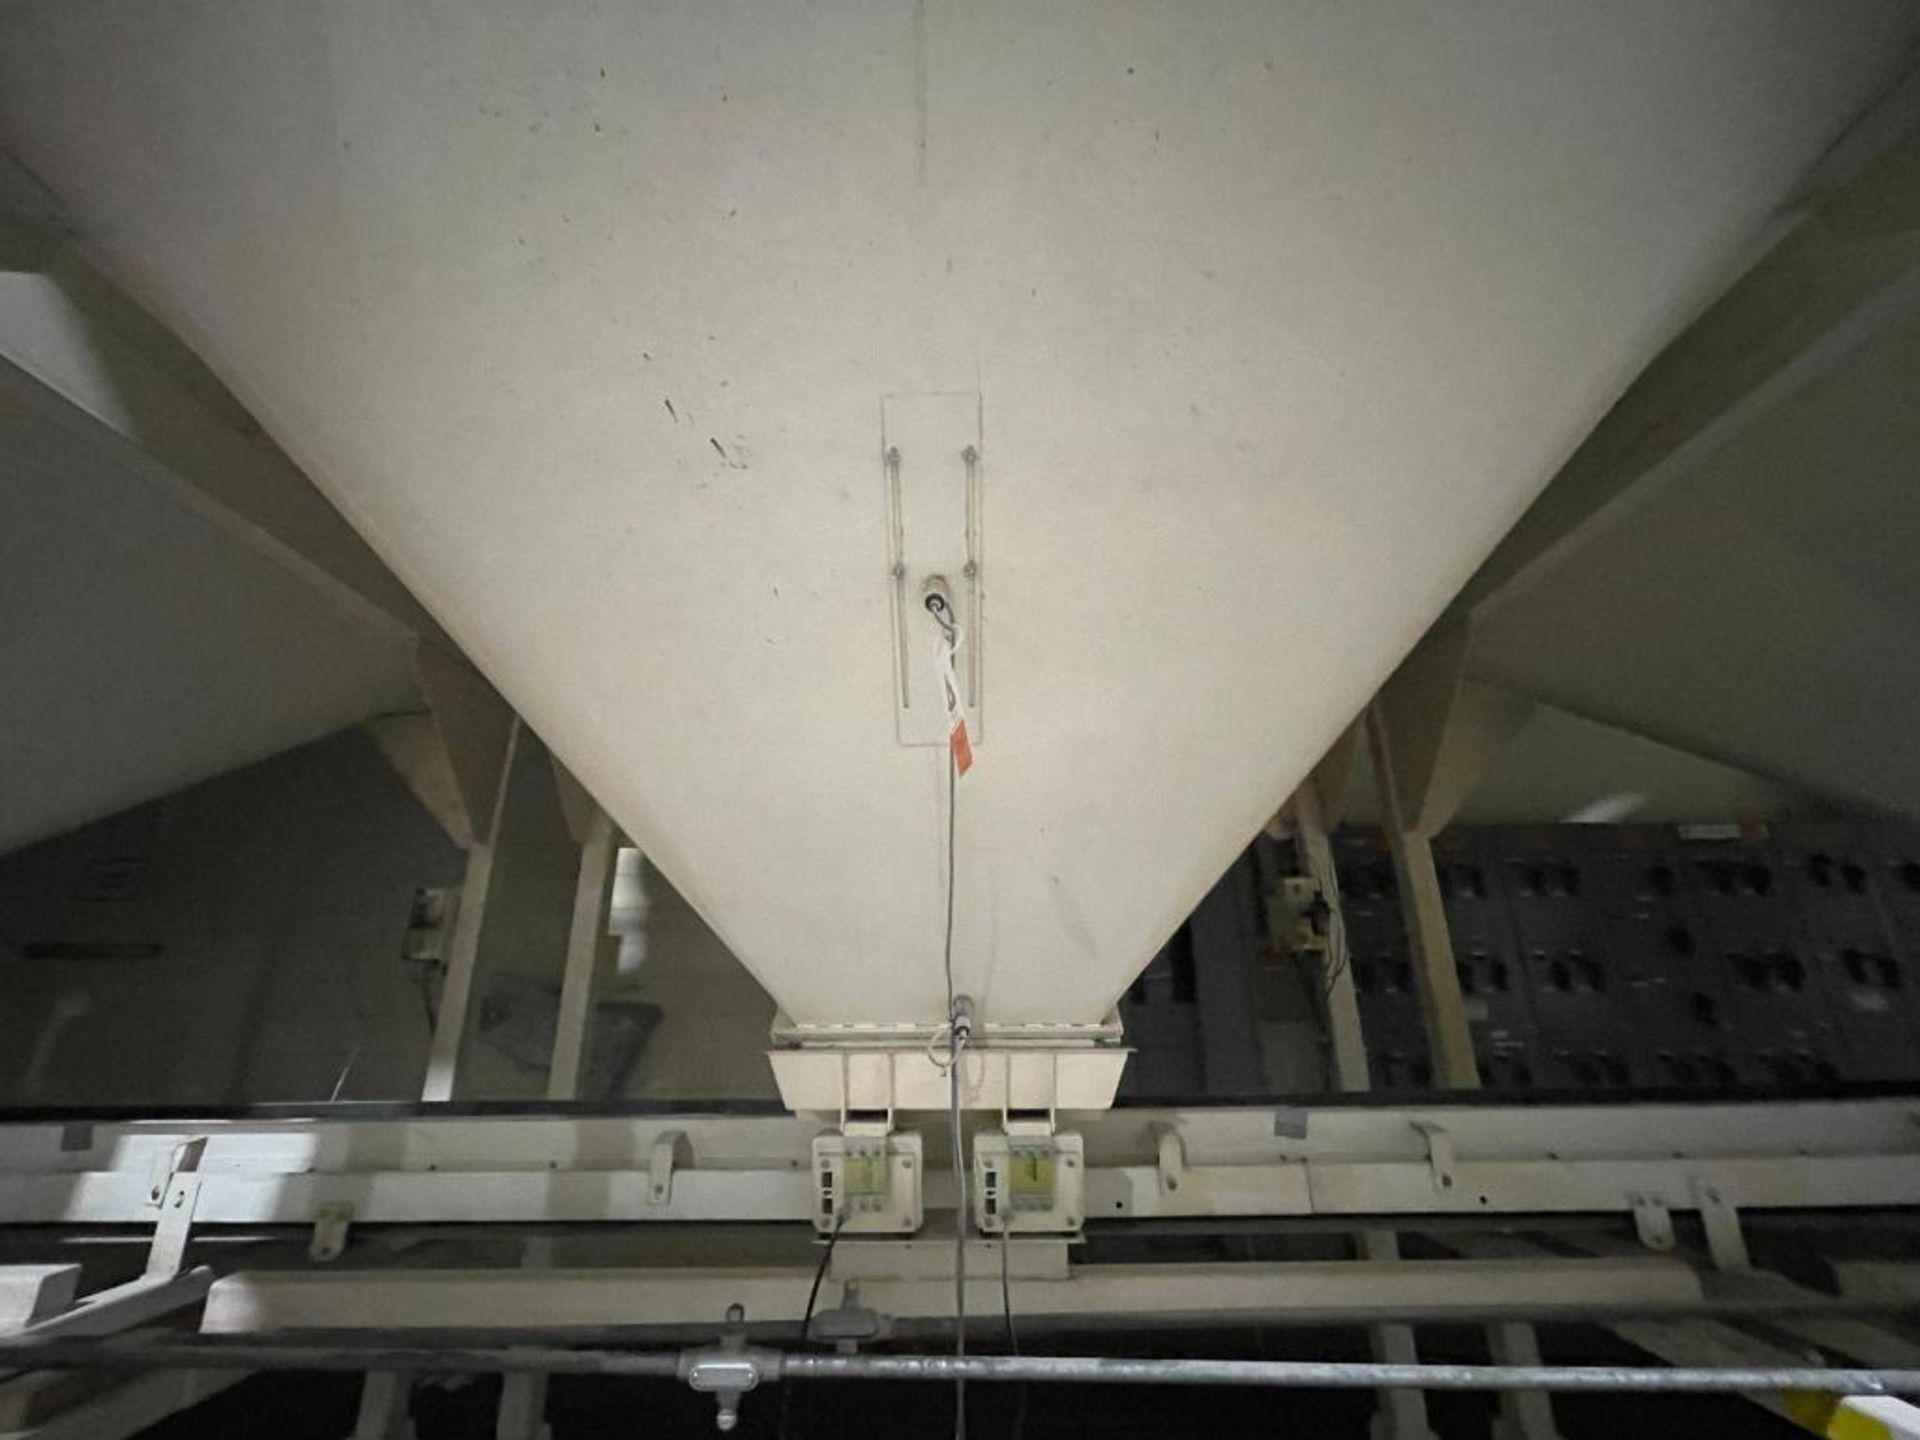 Aseeco mild steel cone bottom bulk storage bin - Image 8 of 28